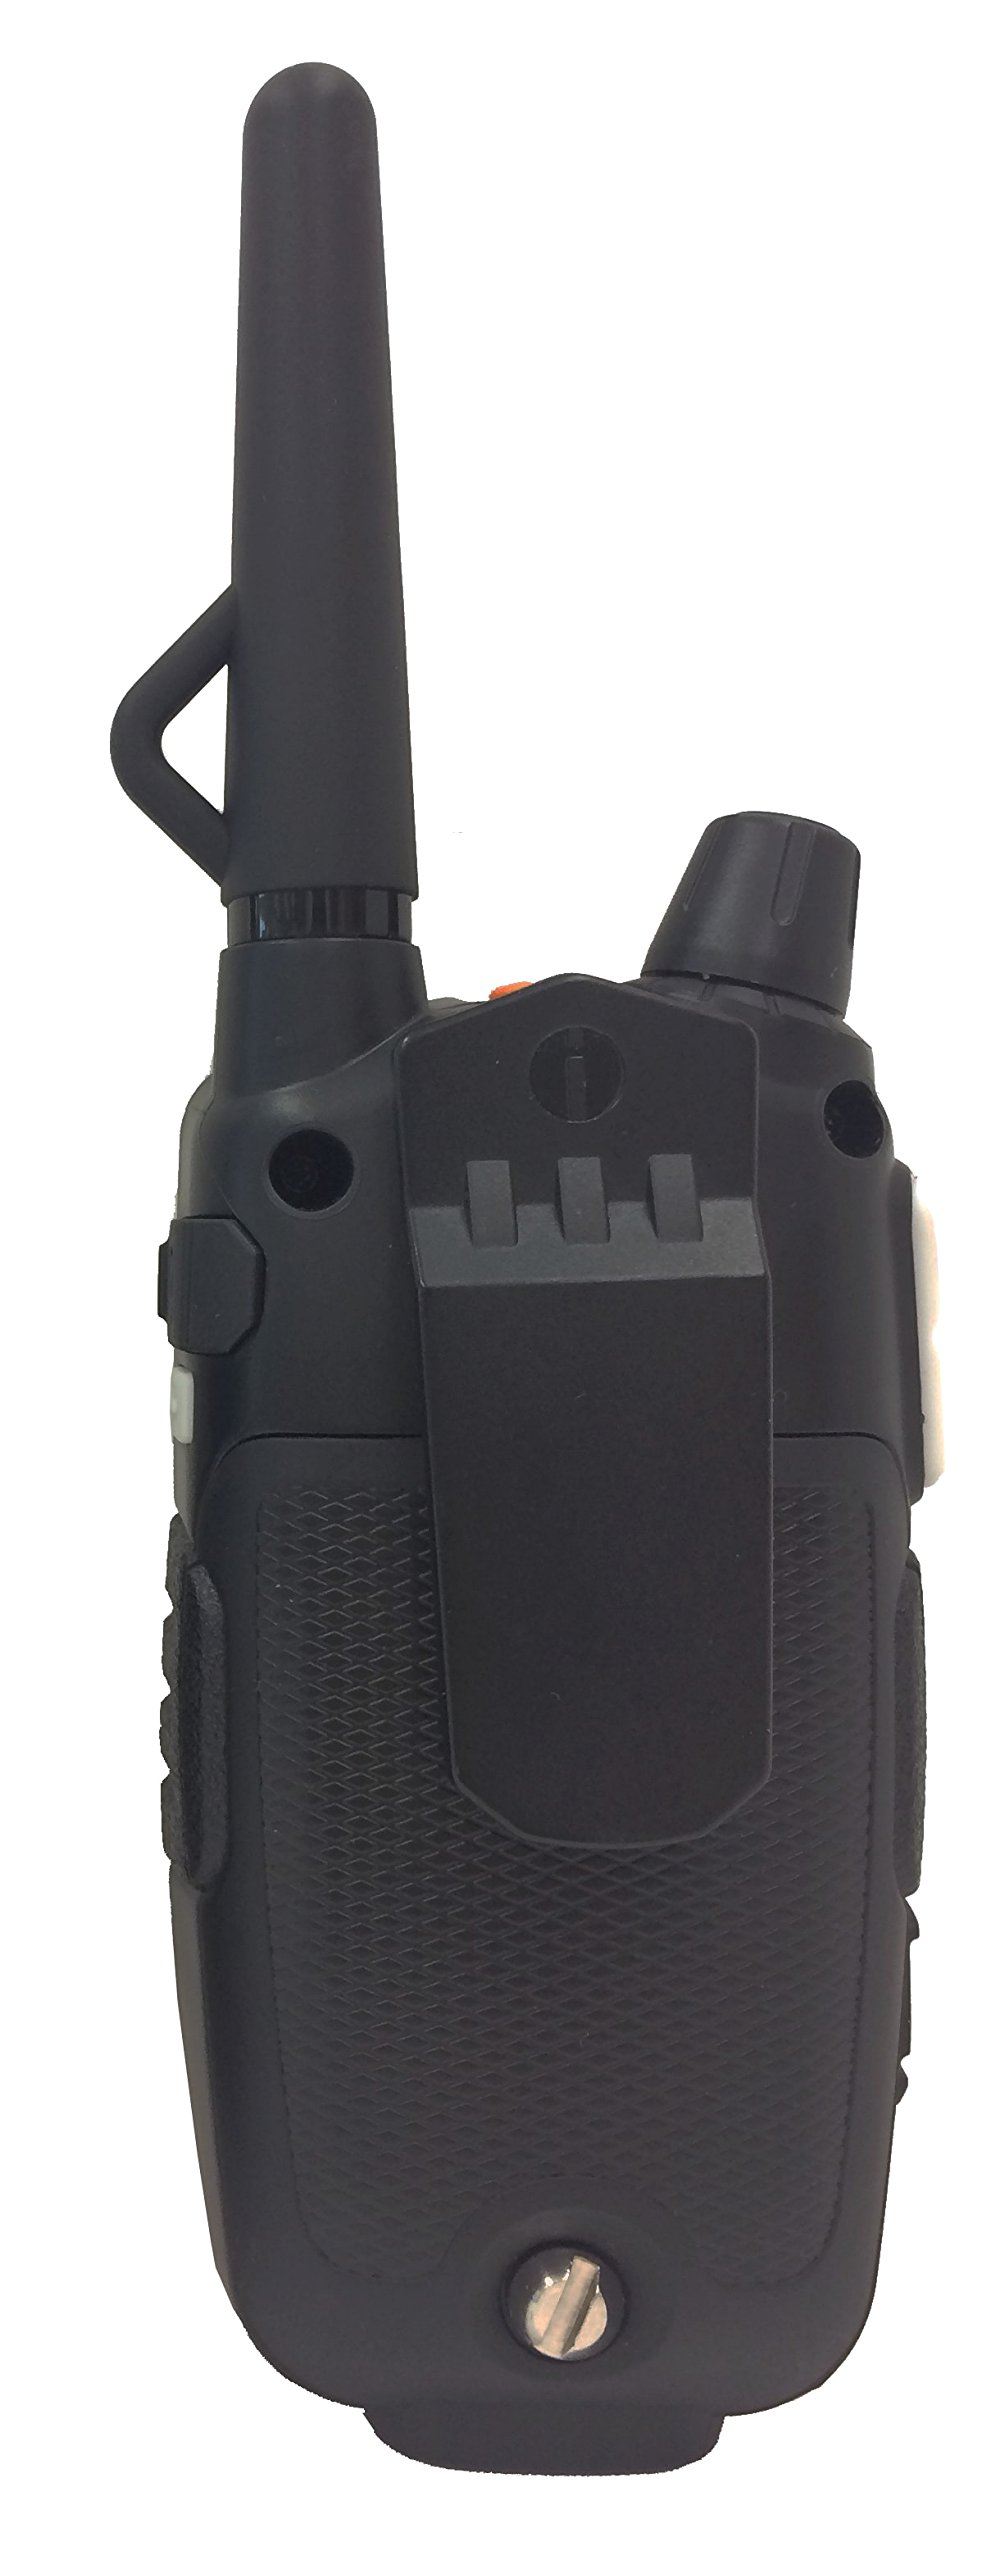 Cobra CXY900 Walkie Talkies 40-Mile Two-Way Radios, Rechargeable (Pair) by Cobra (Image #2)